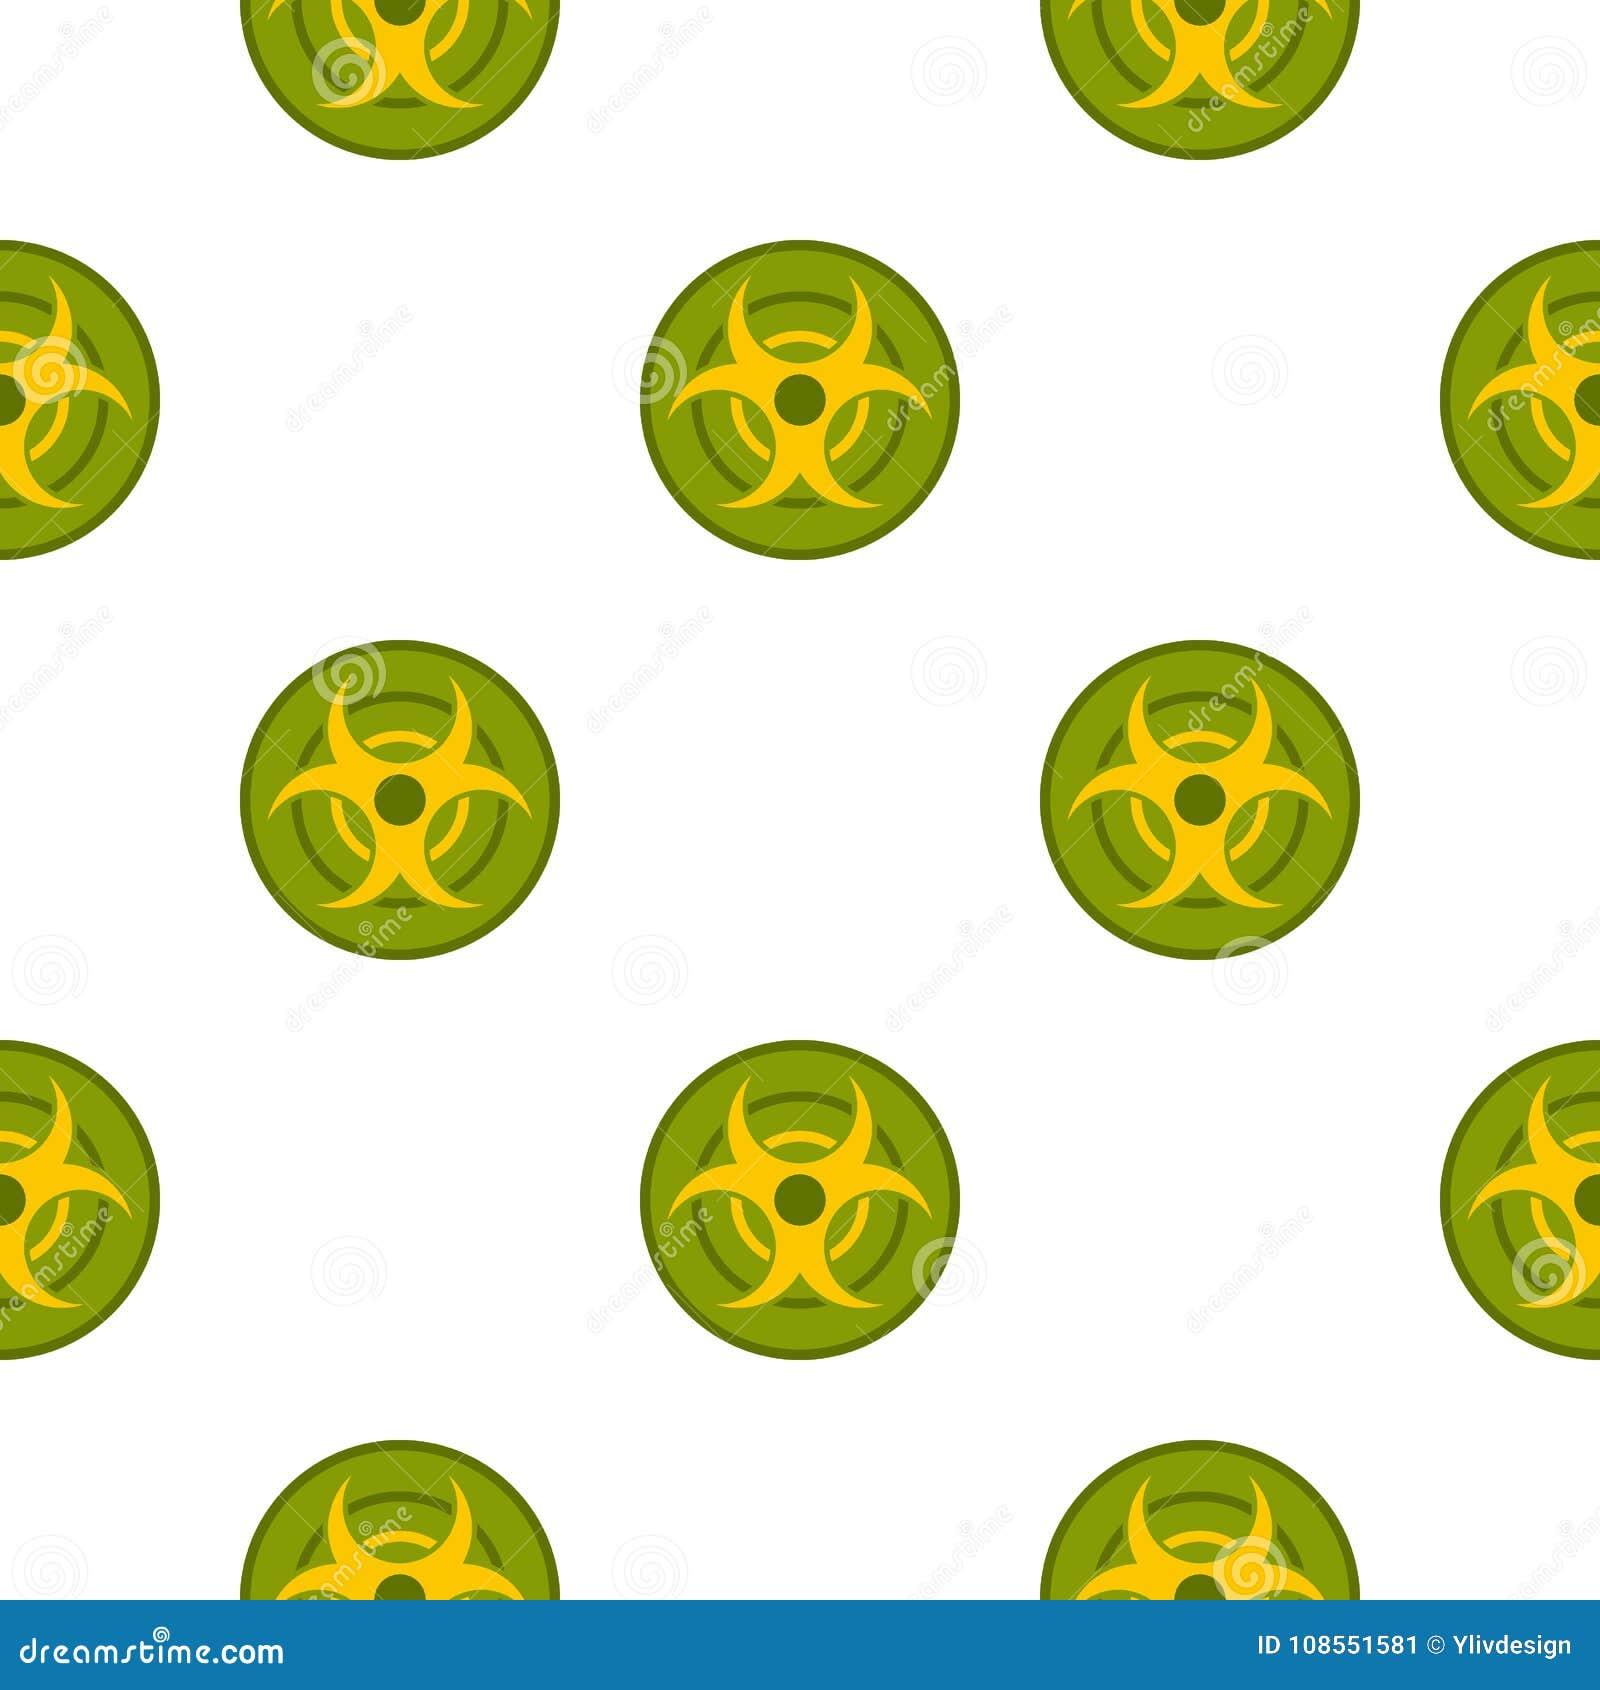 Biohazard symbol pattern seamless stock vector illustration of biohazard symbol pattern seamless biocorpaavc Images